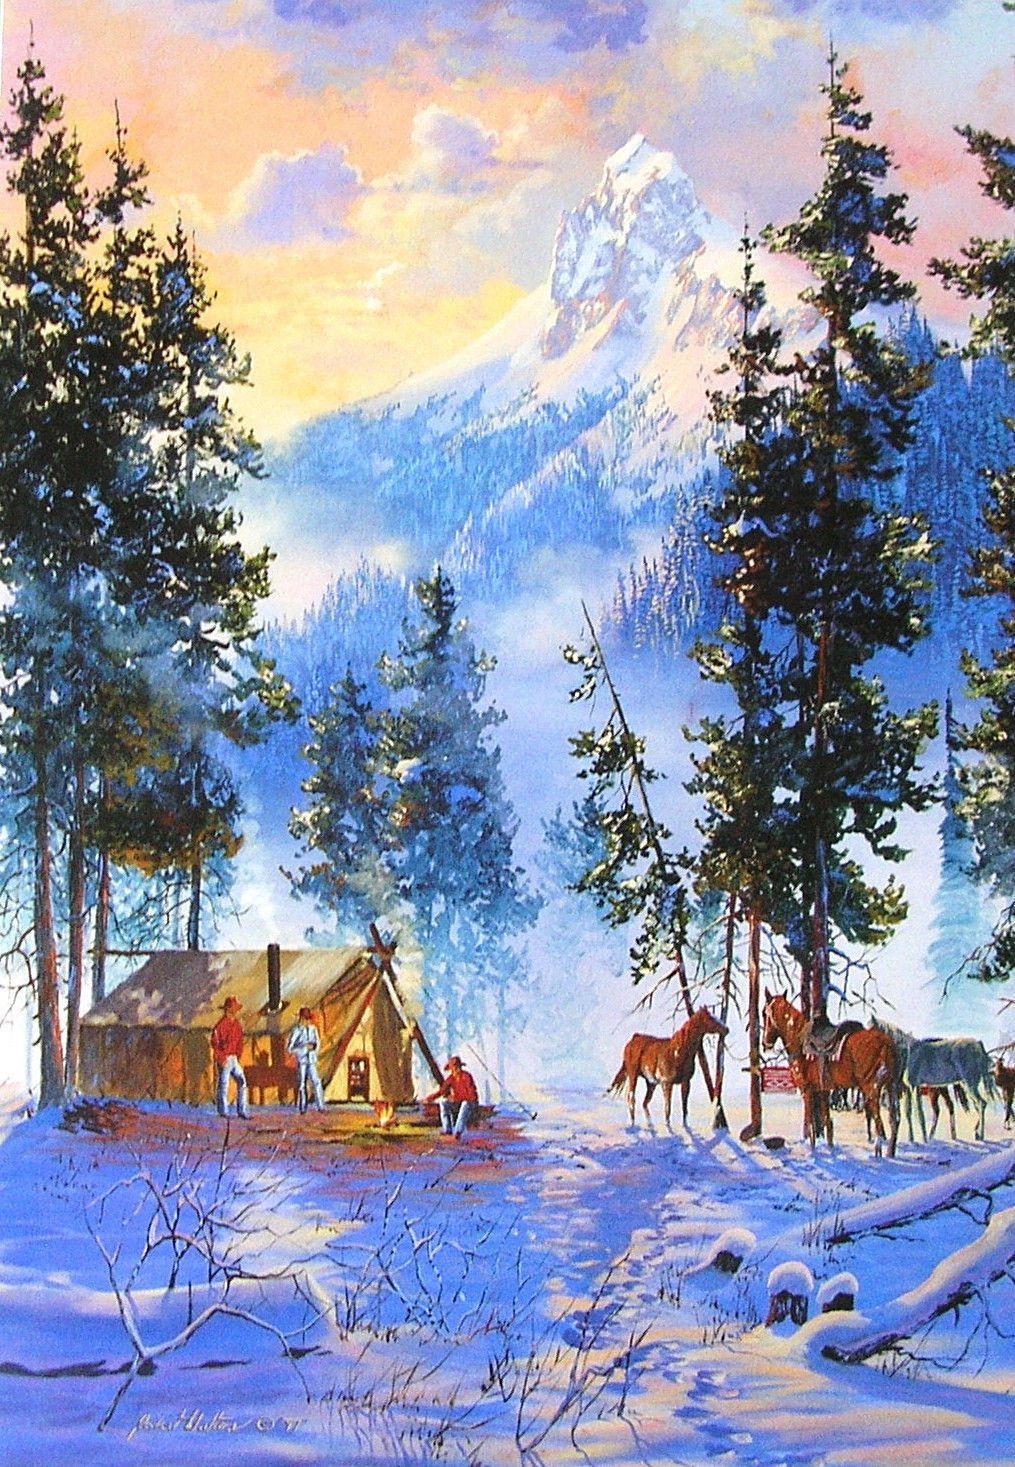 Leanin Tree Robert L Walton Horse Mountain Cowboy Camp Christmas